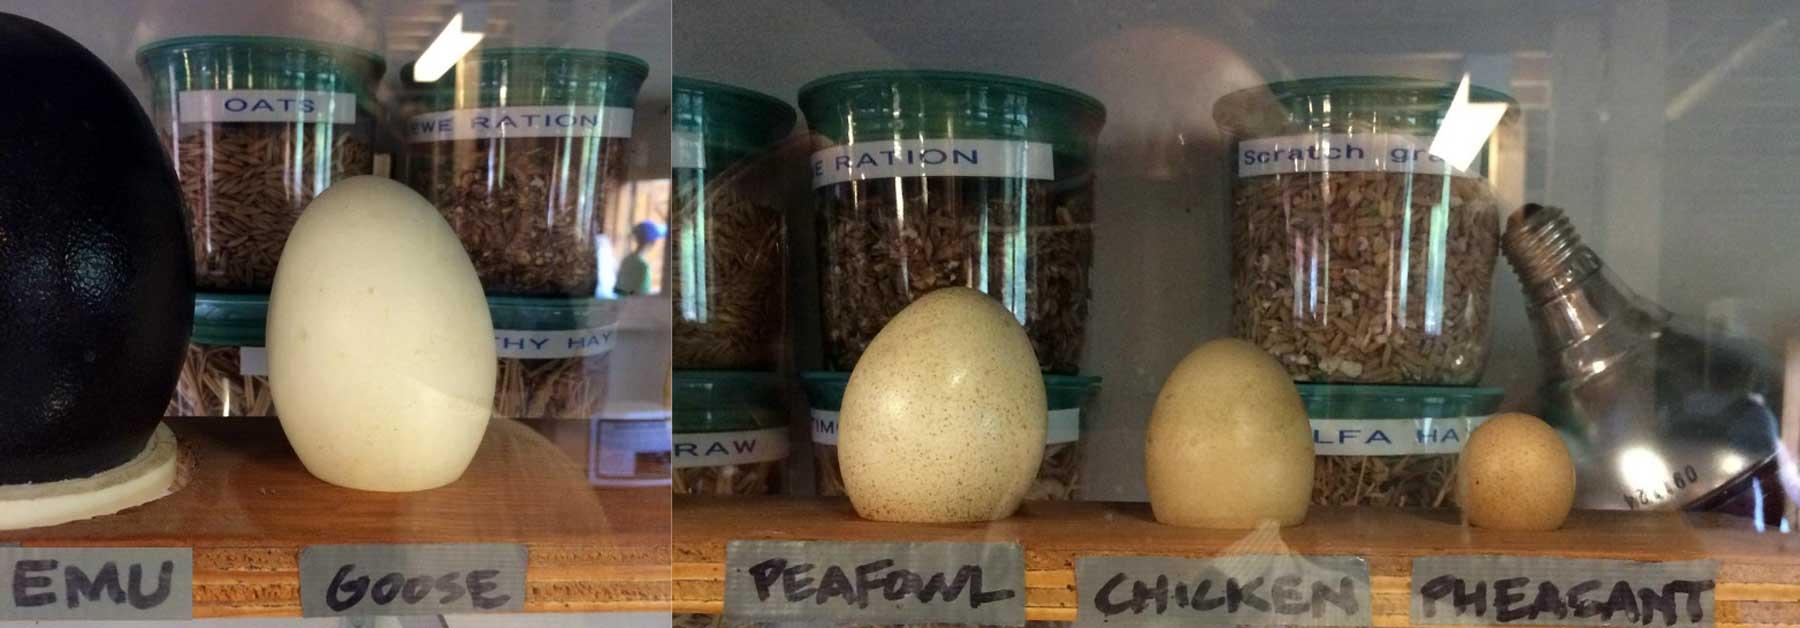 Size comparison of different eggs